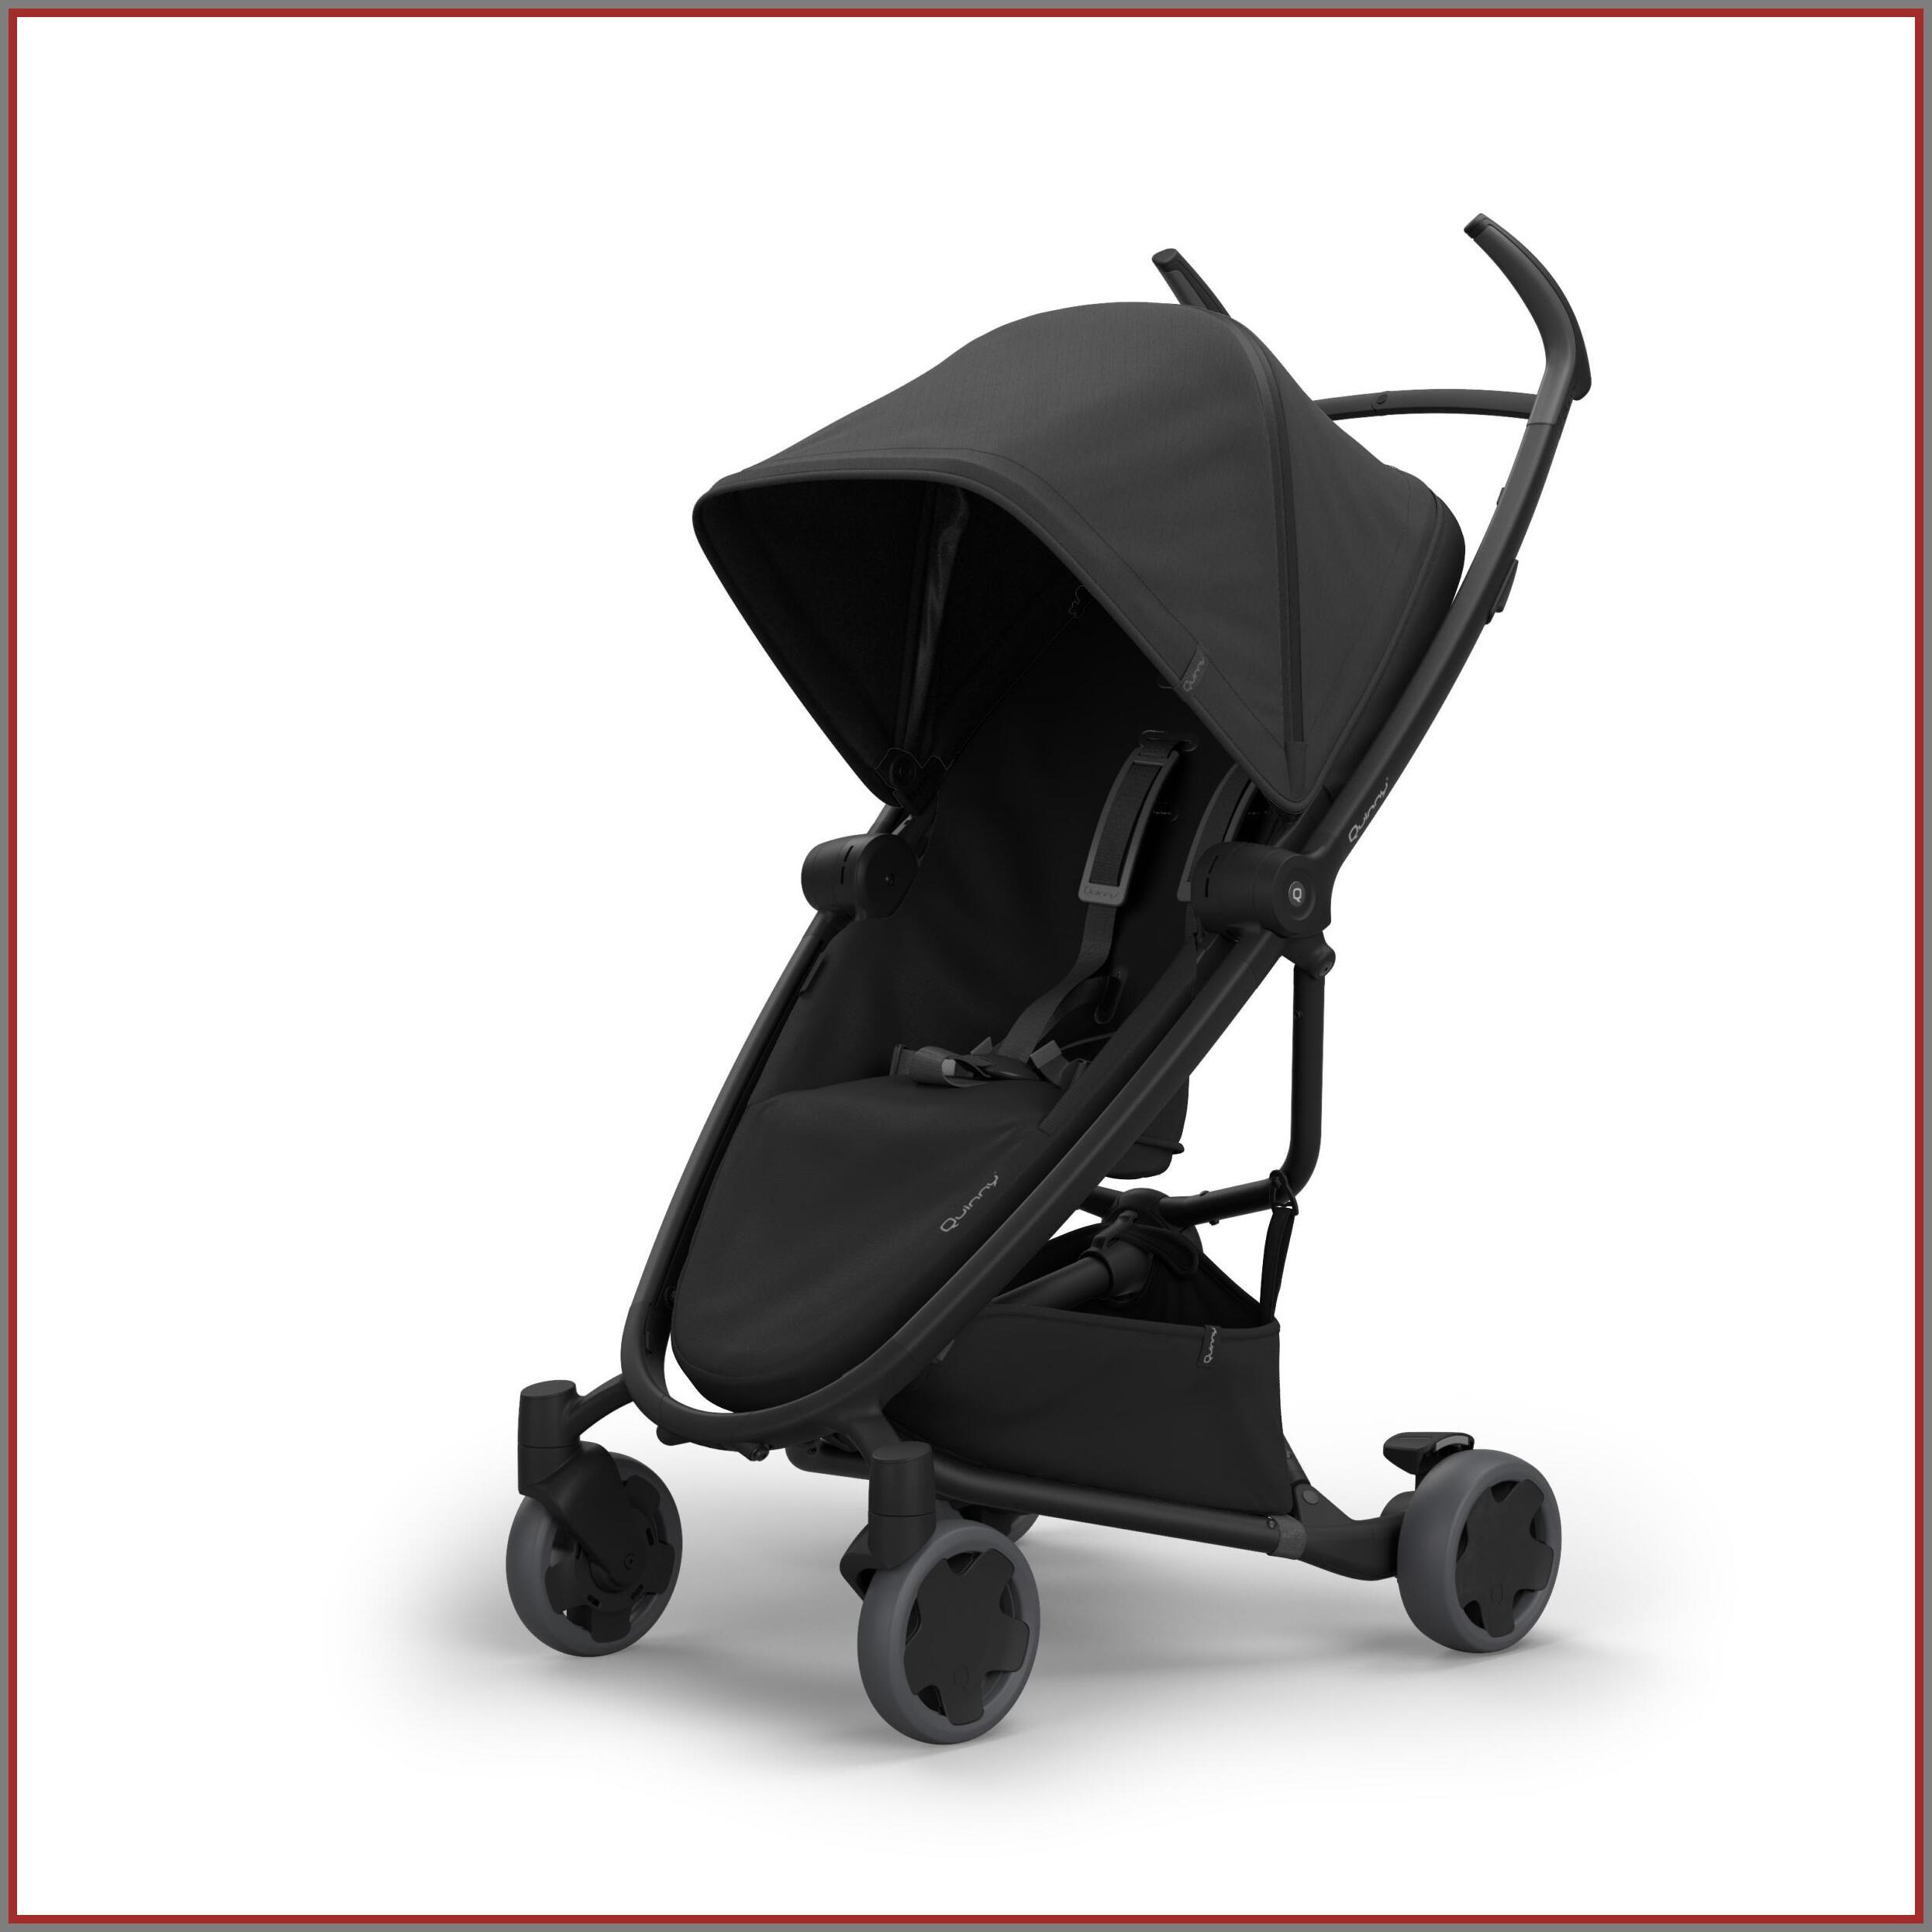 31++ Britax stroller board instructions info